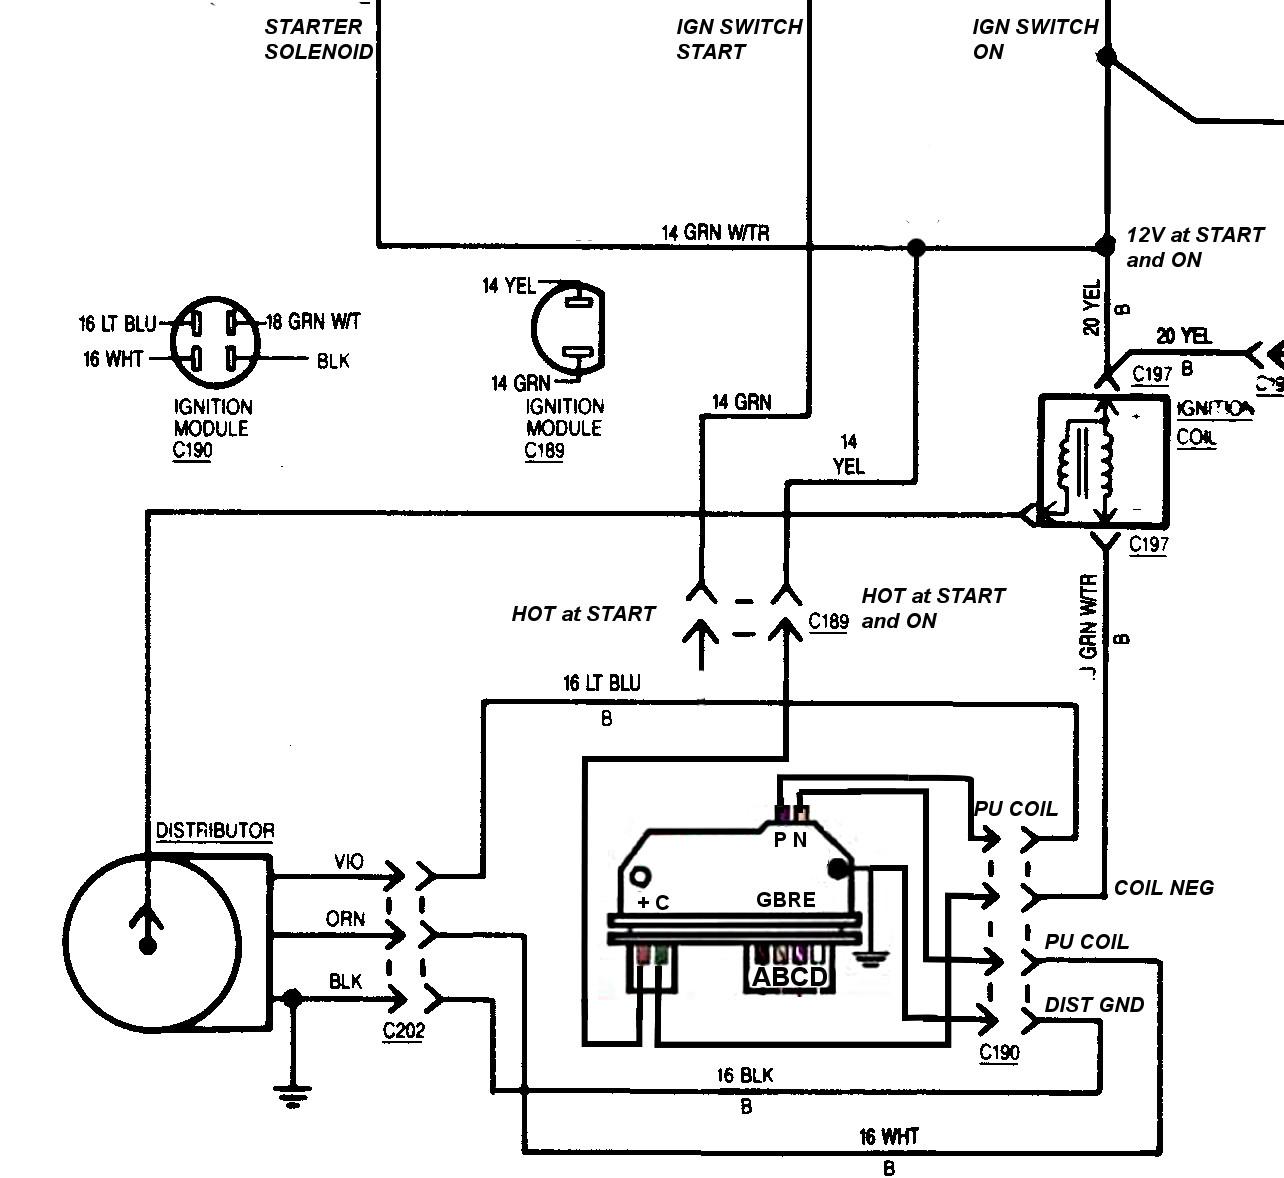 accel ignition wiring diagram diy solar panel system control module imageresizertool com